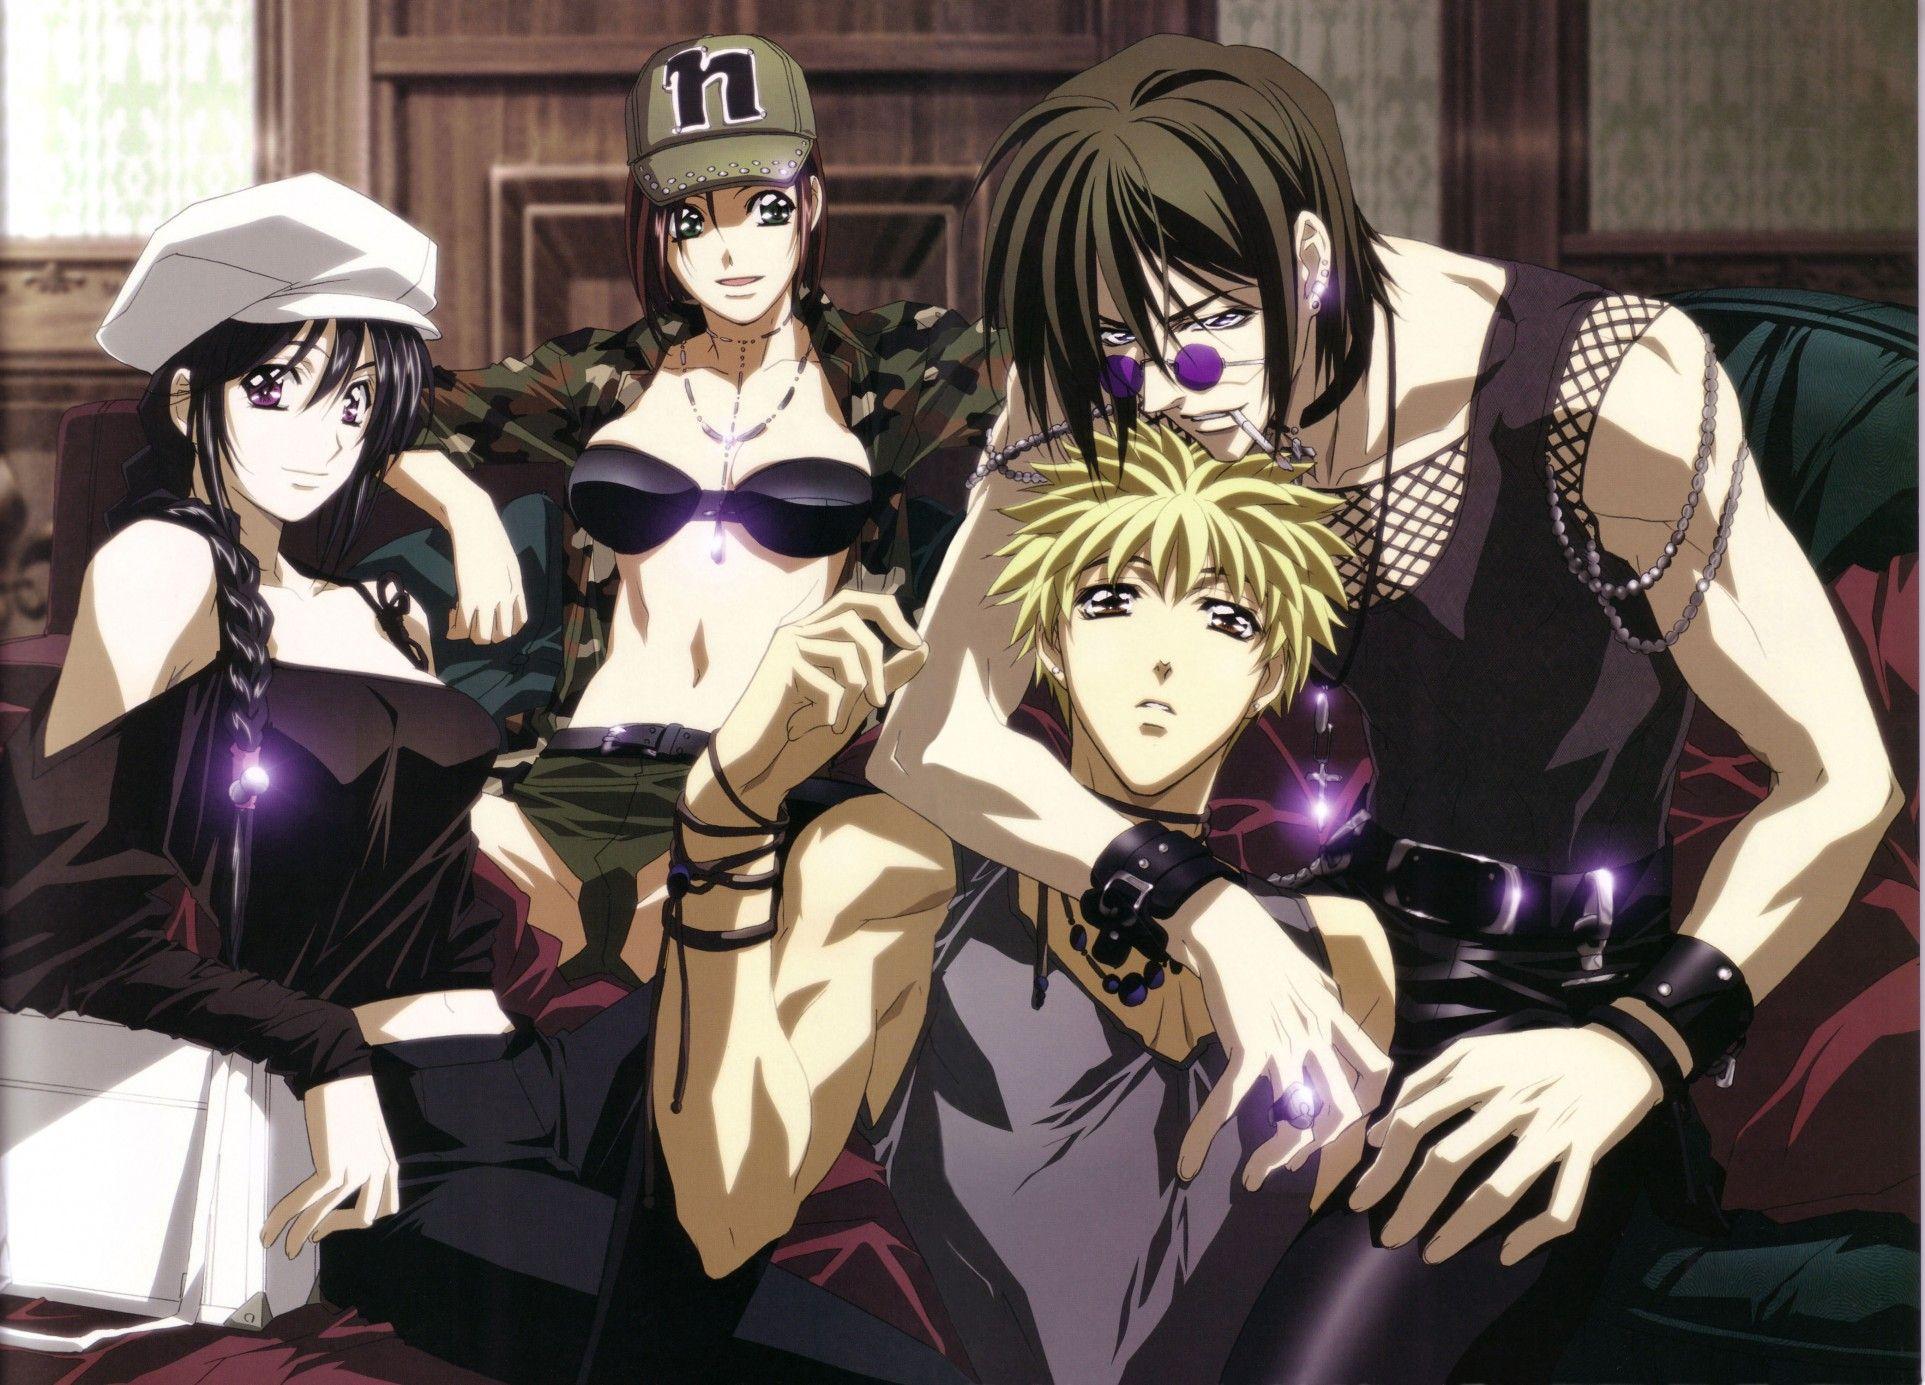 Anime Getbackers Wallpaper #anime #manga   character art ...